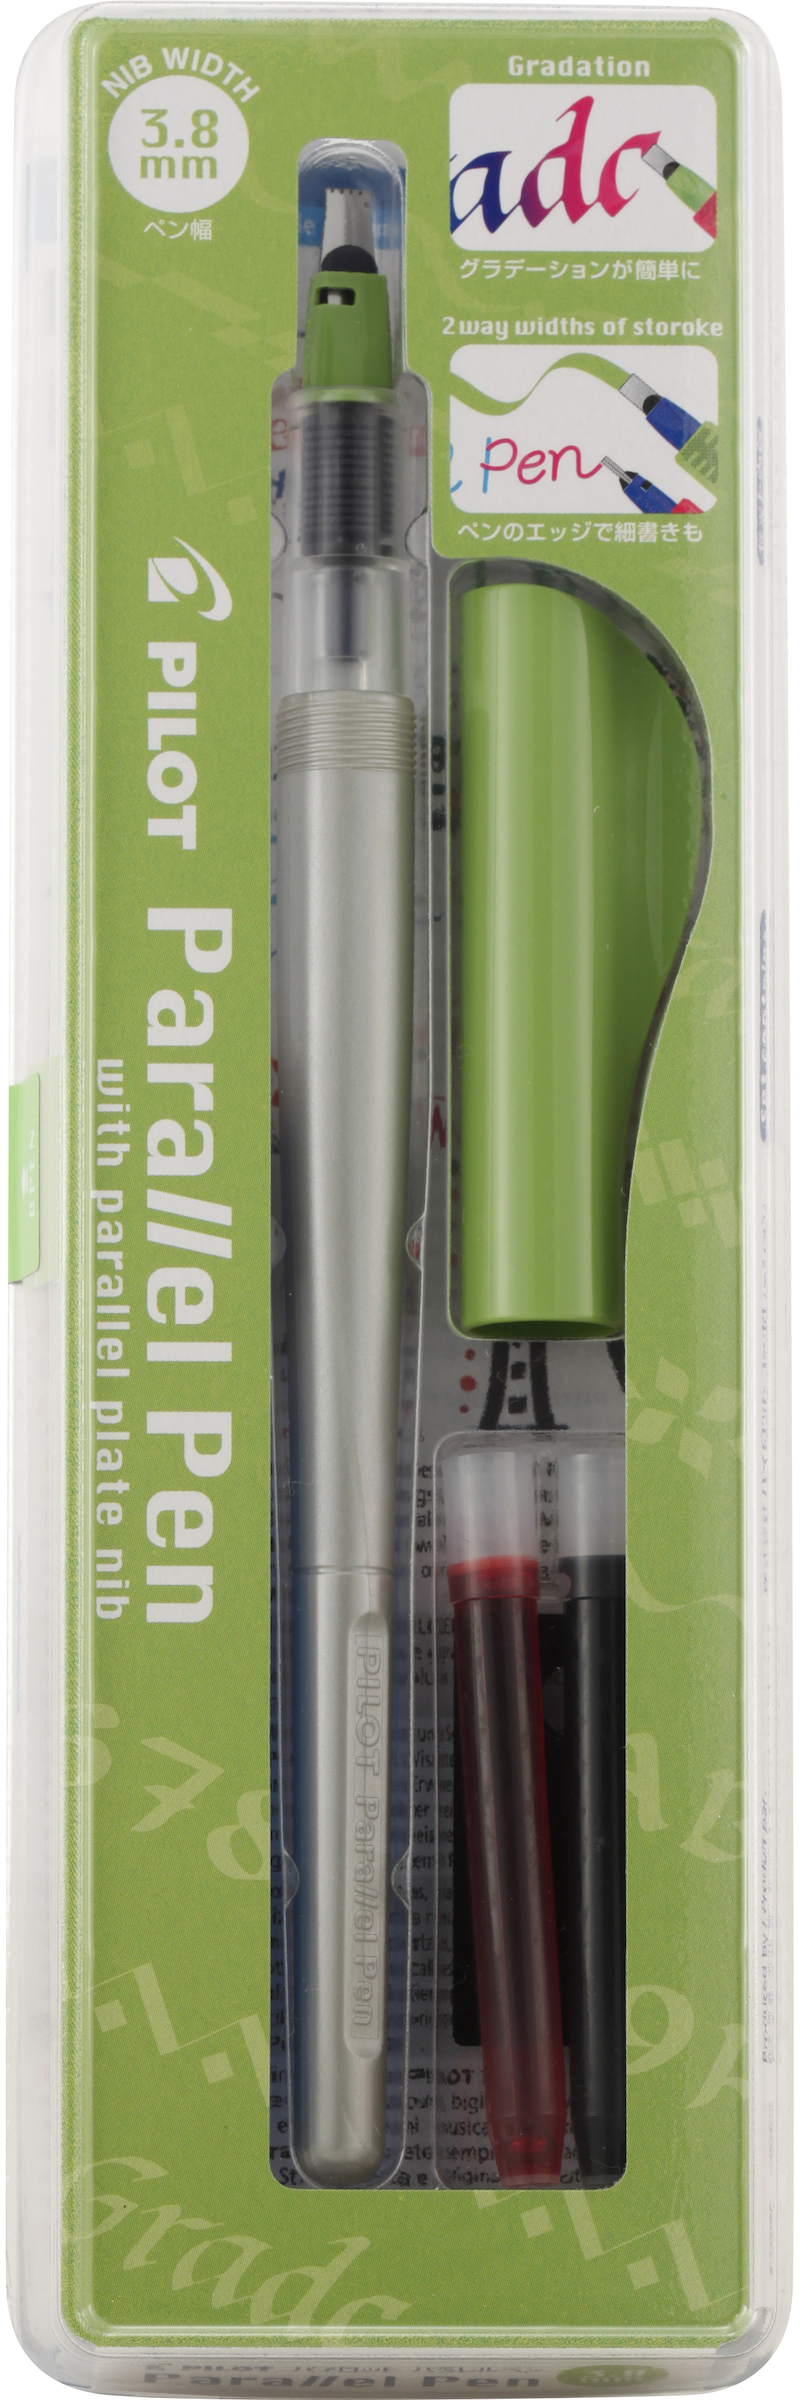 Parallel Pen, 3.8mm